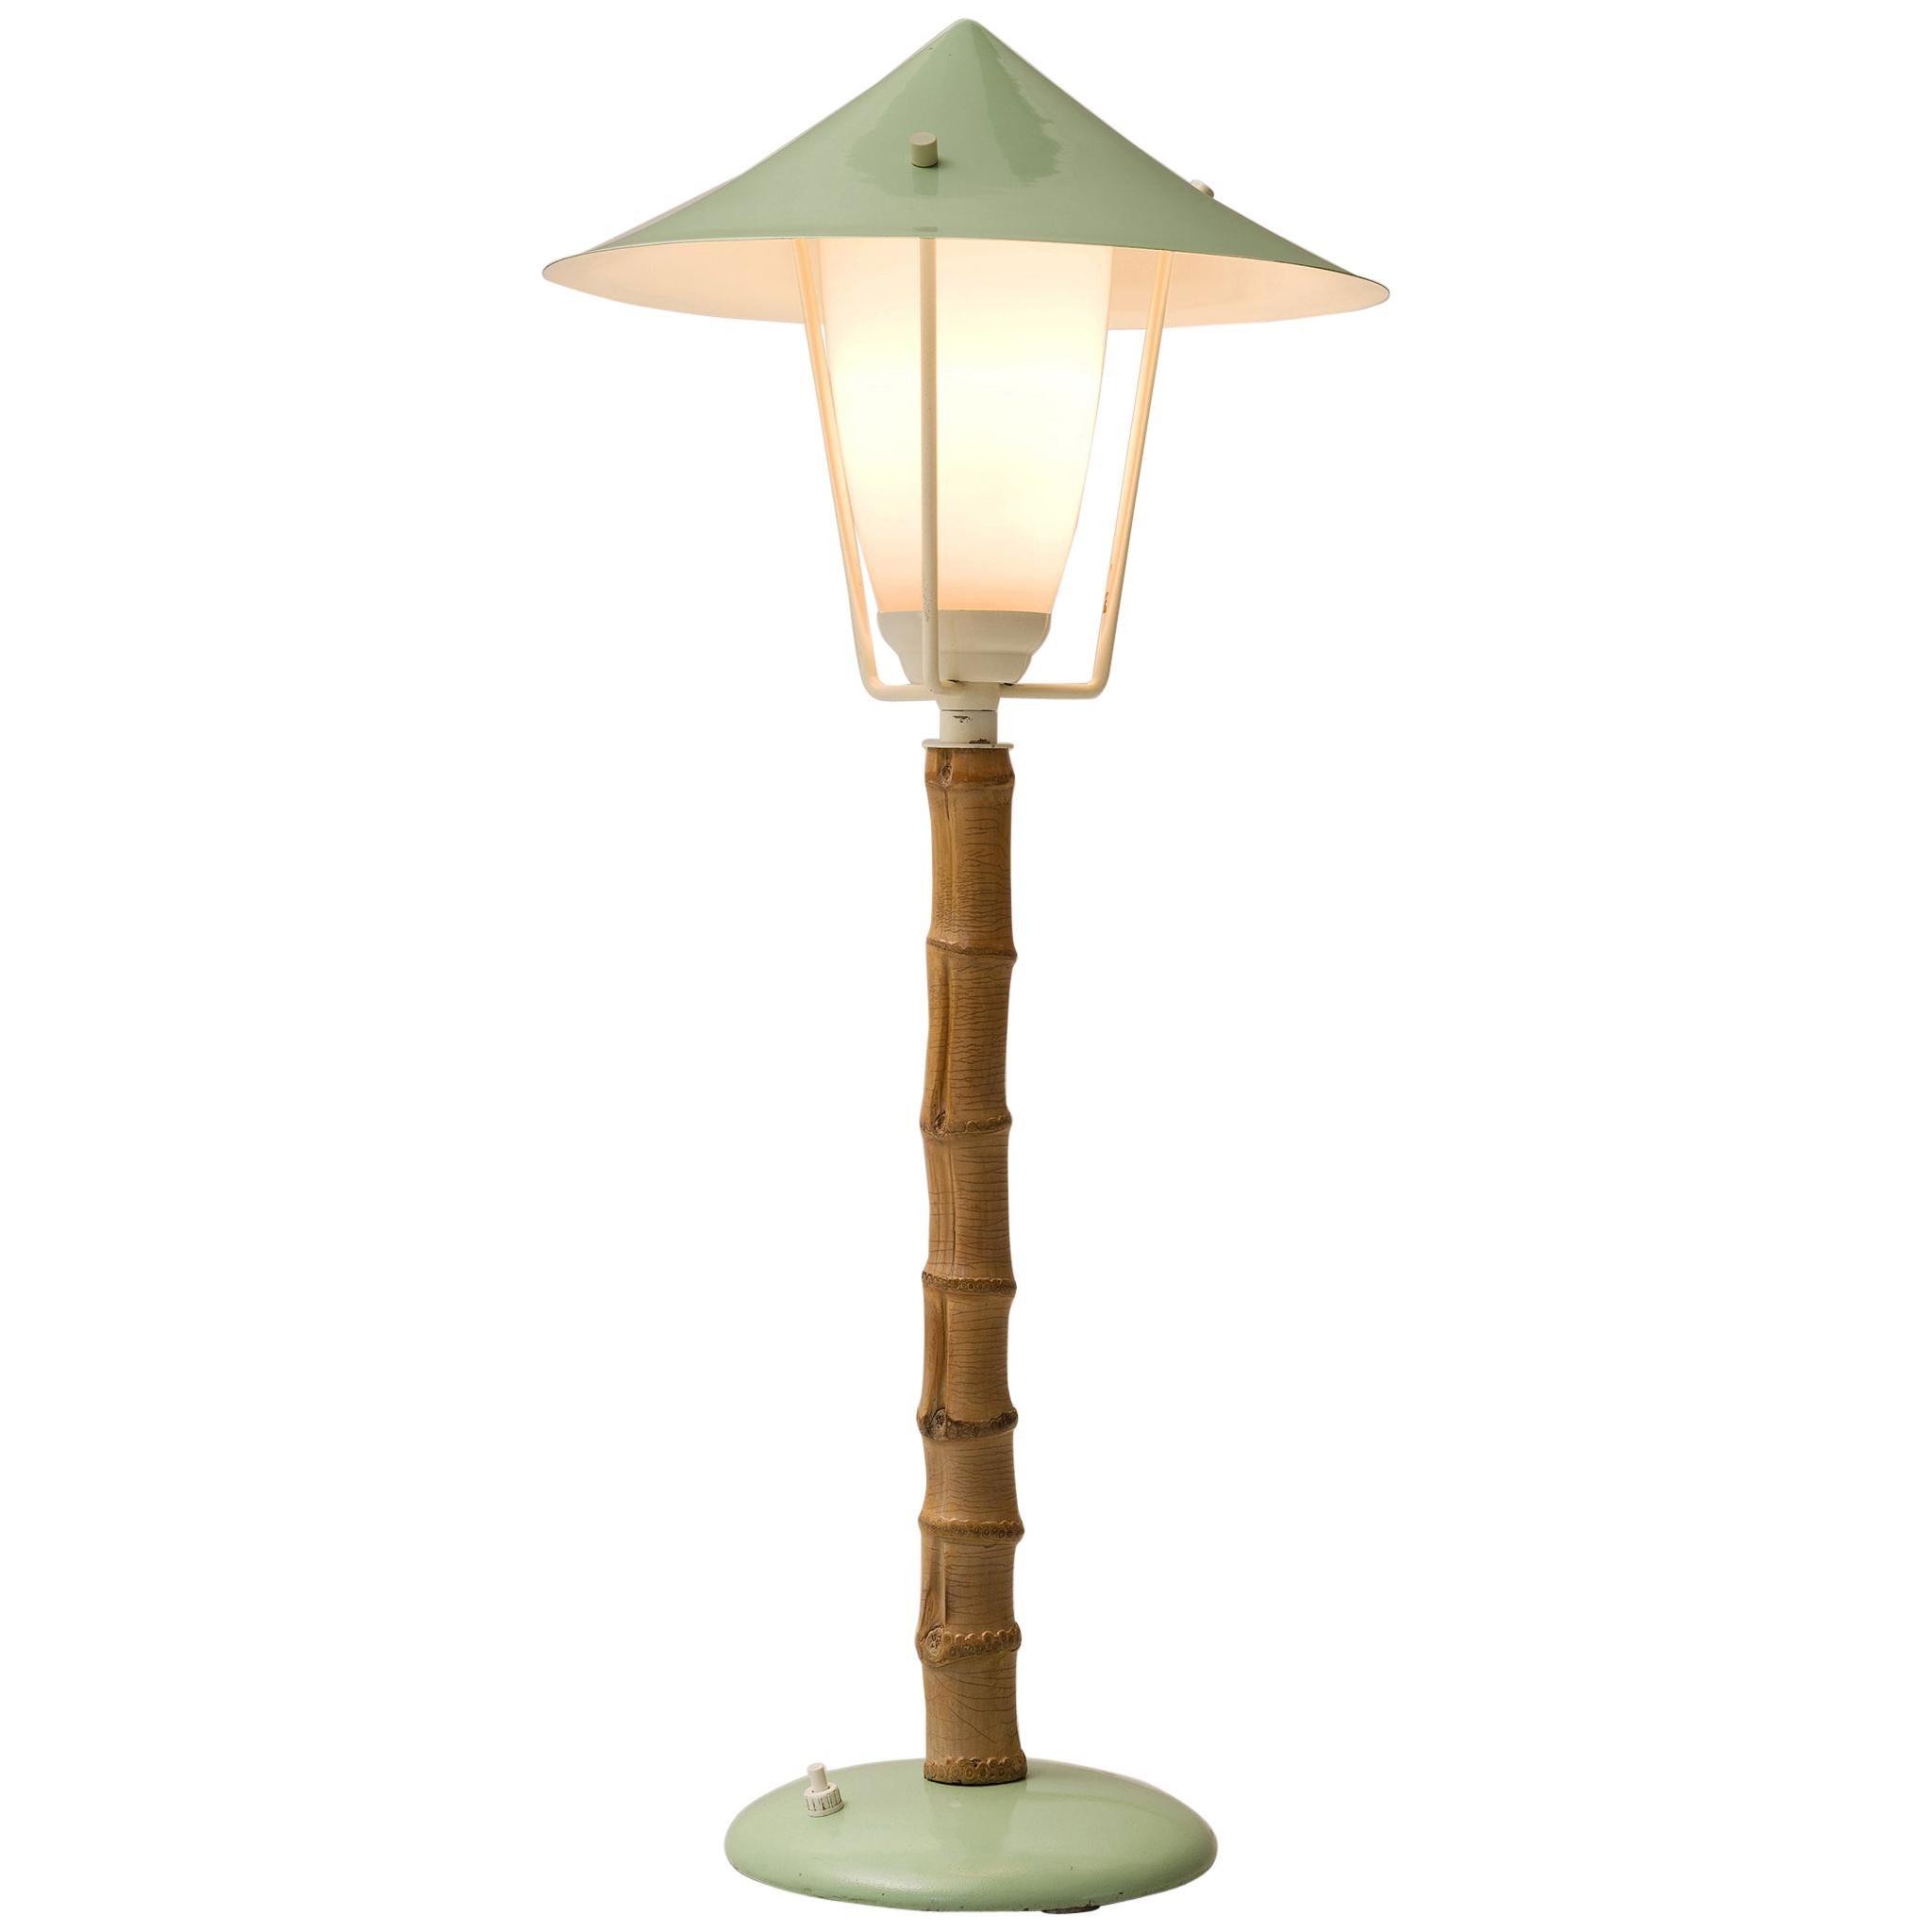 J.T. Kalmar 'Karla' Bamboo Green Table Lamp